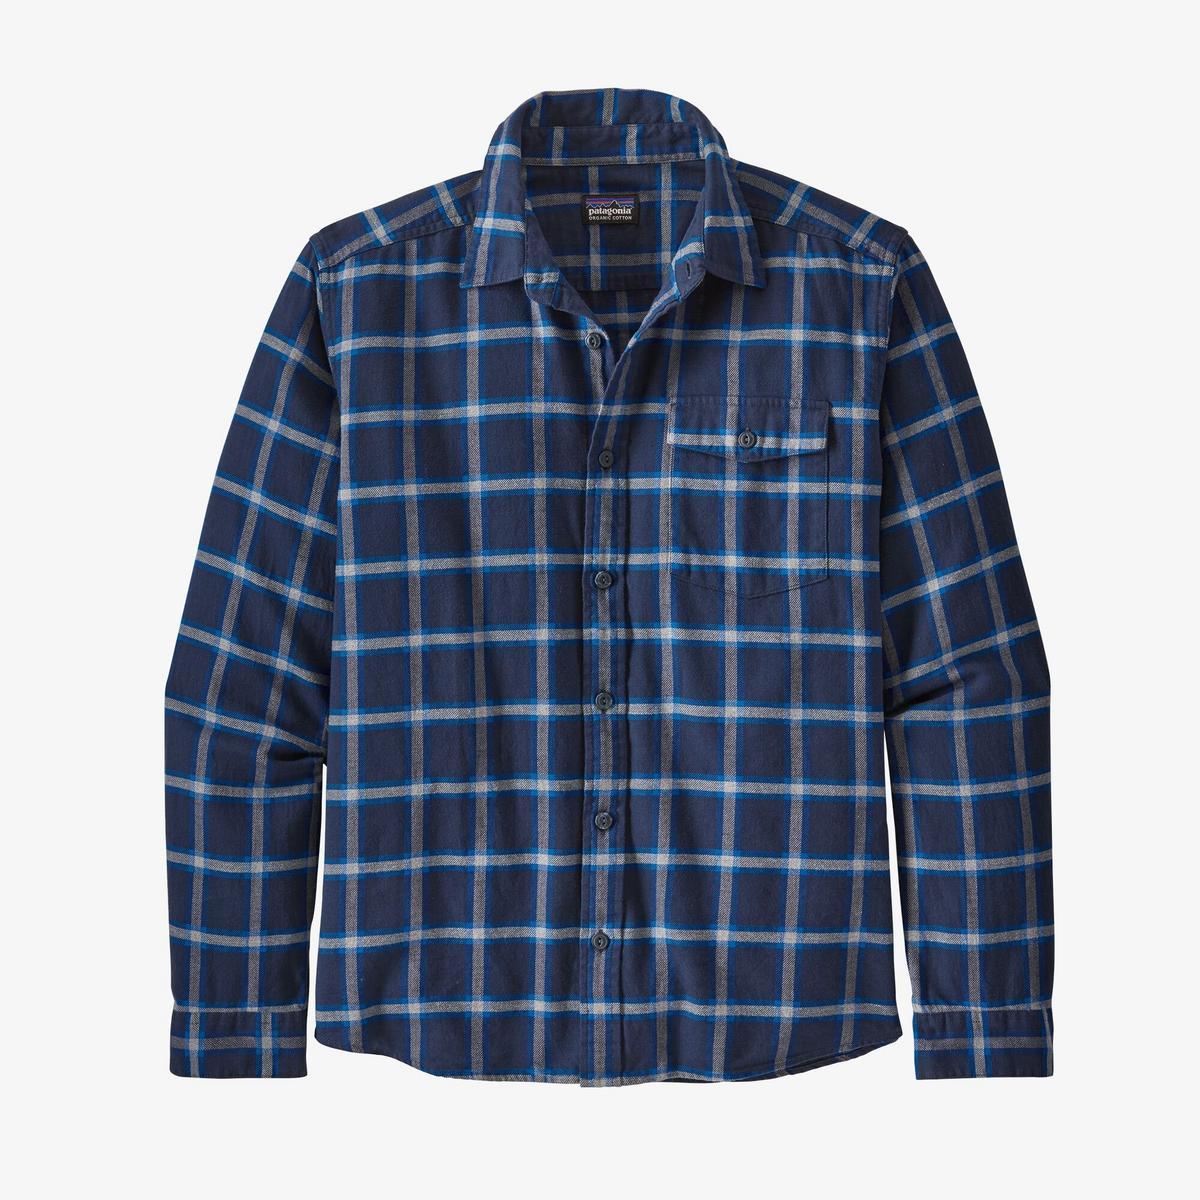 Patagonia Men's Fjord Flannel Shirt - Navy